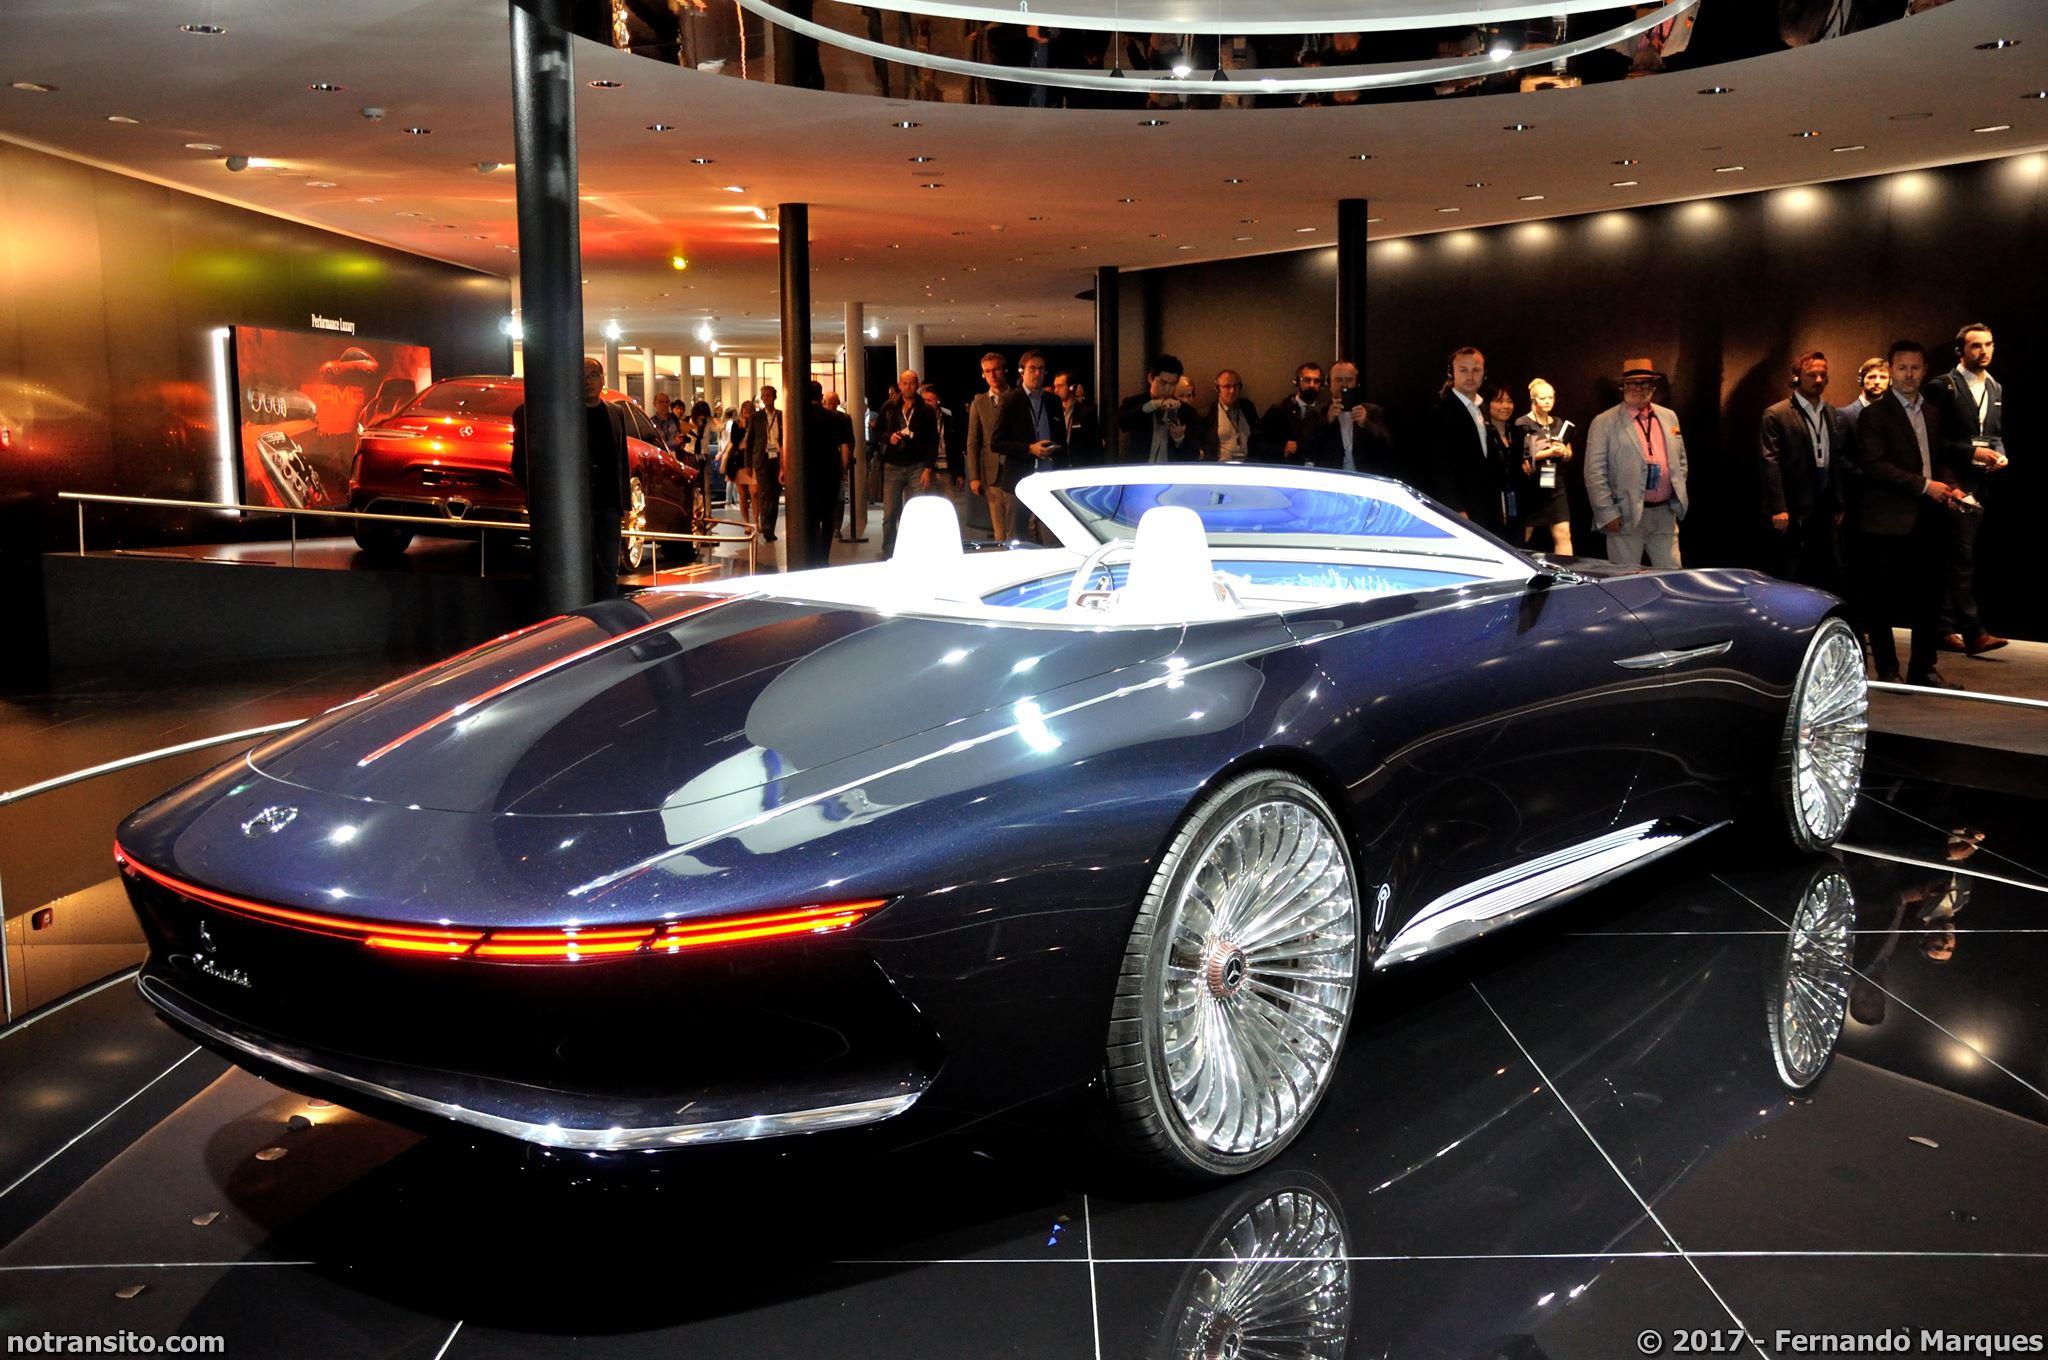 Vision-Mercedes-Maybach-6-Cabriolet-Frankfurt-2017-004